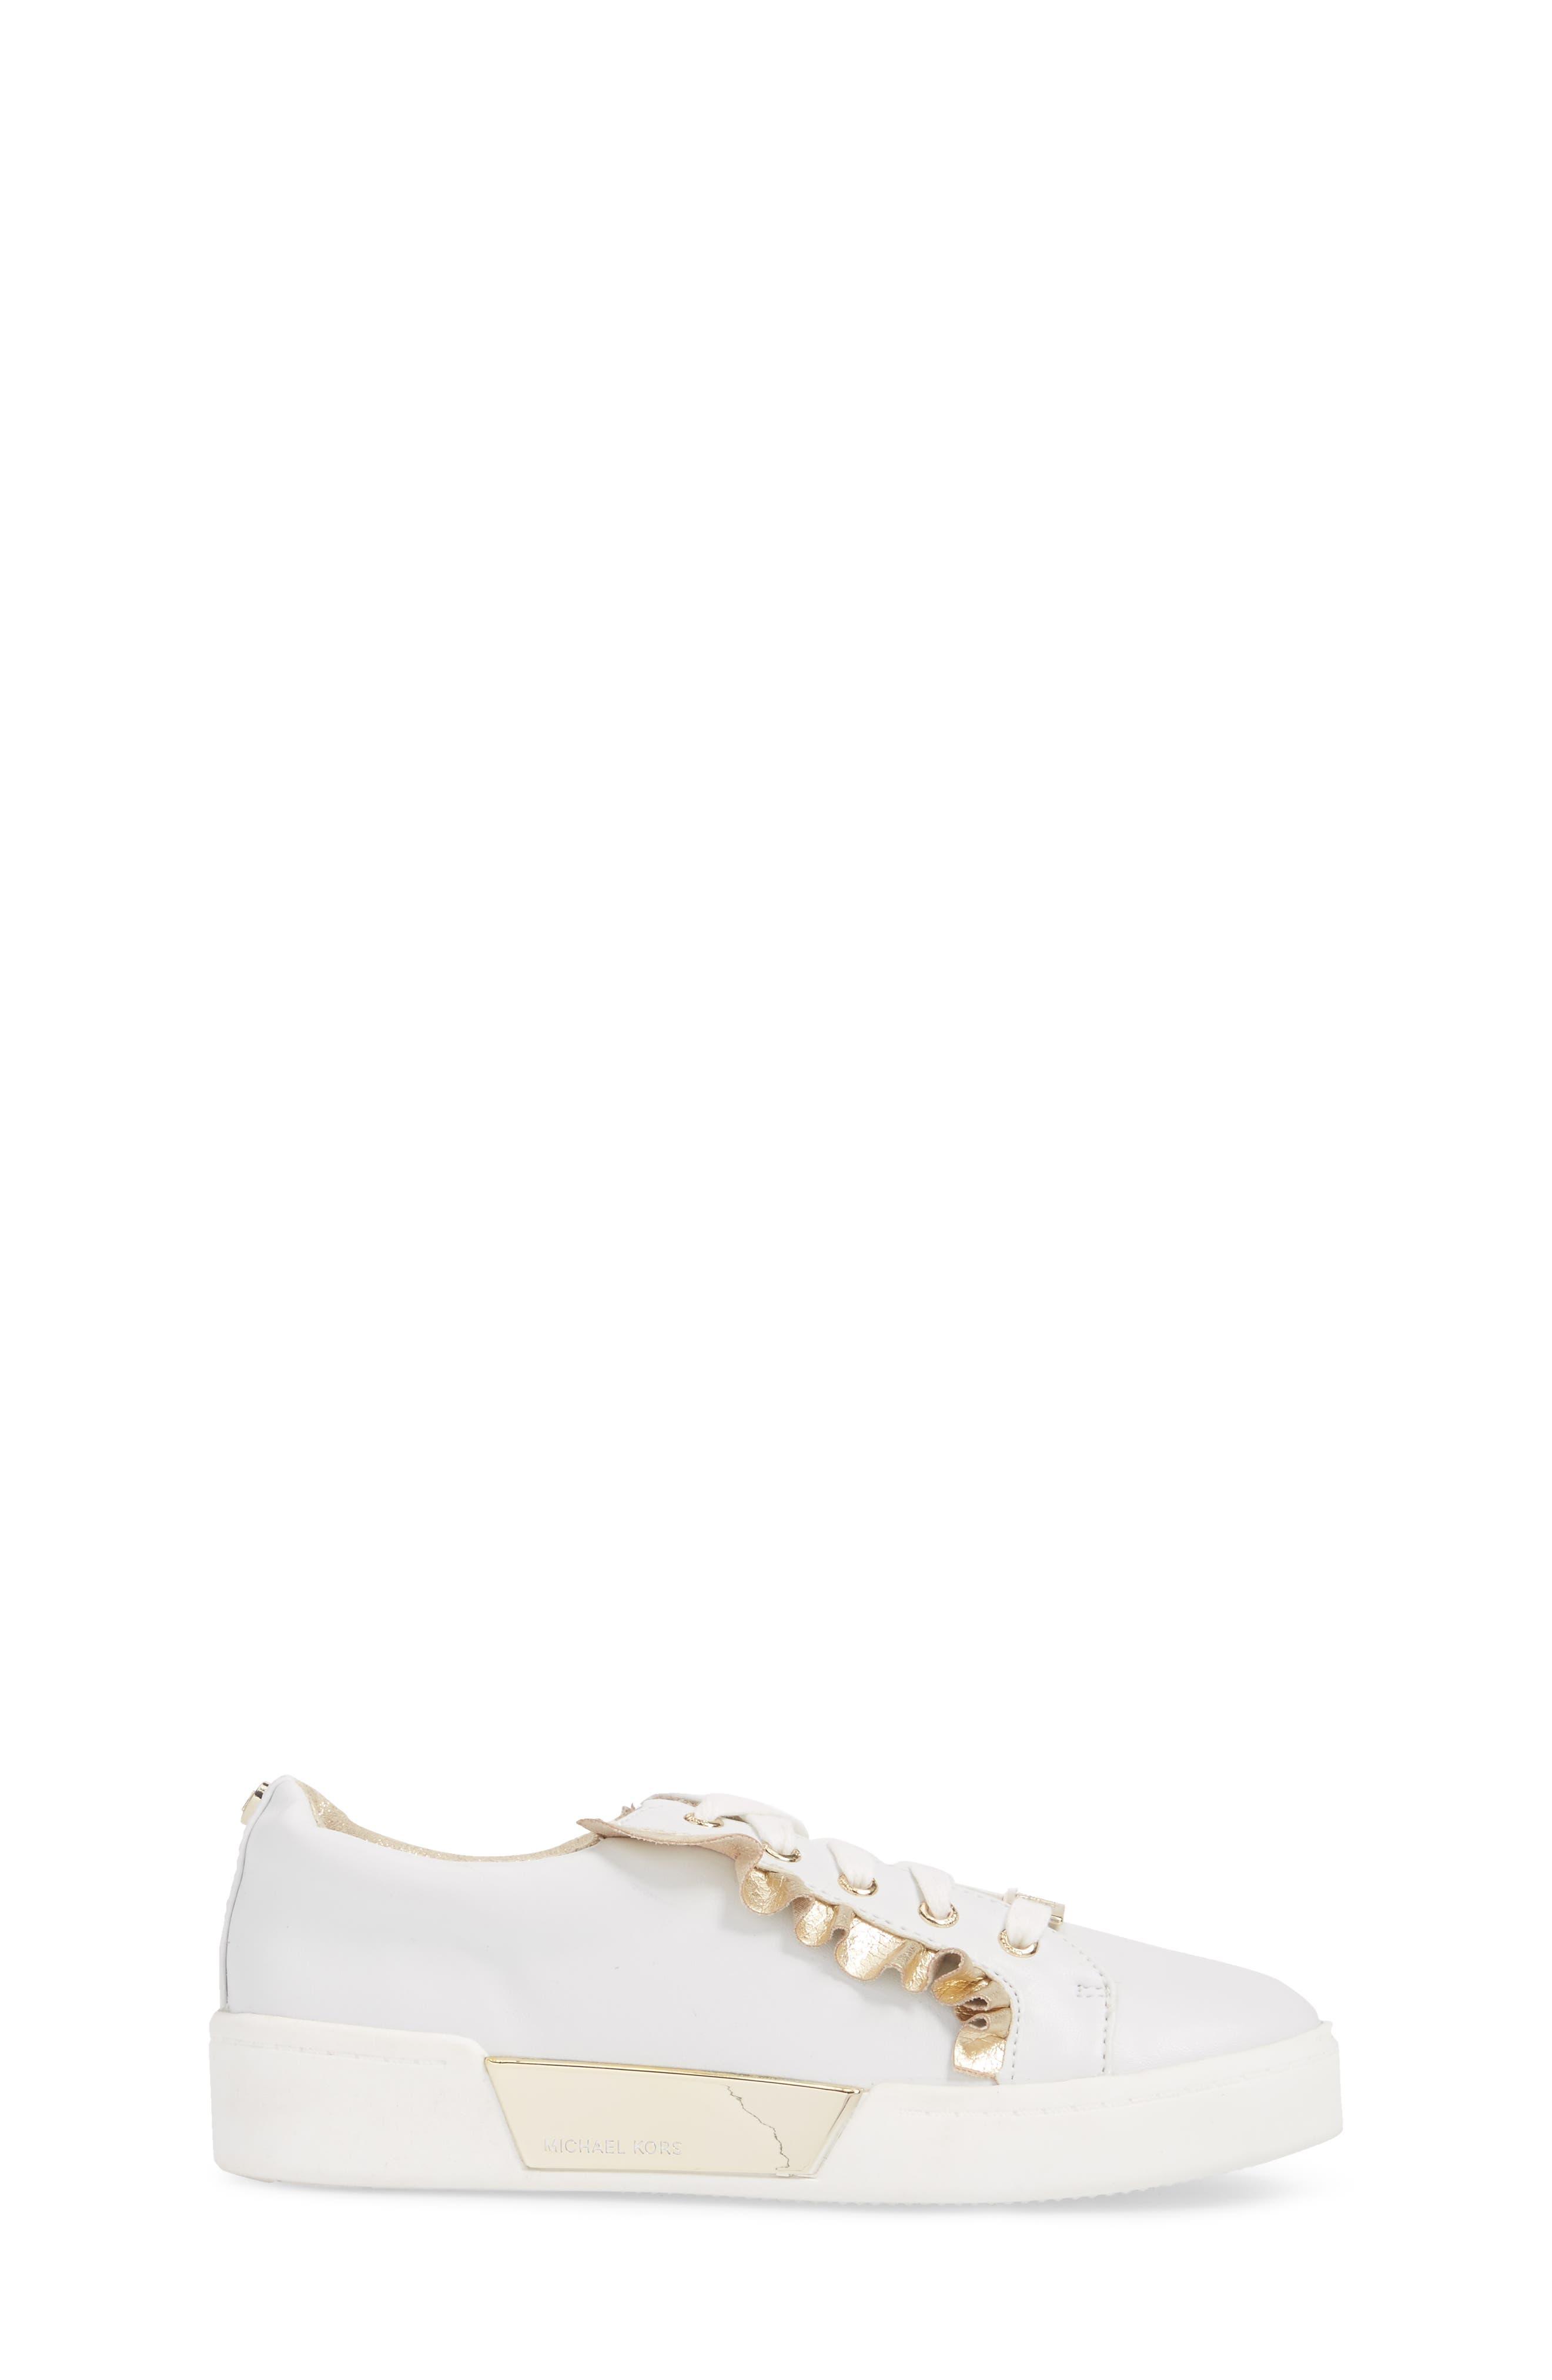 Guard Rail Sneaker,                             Alternate thumbnail 3, color,                             White